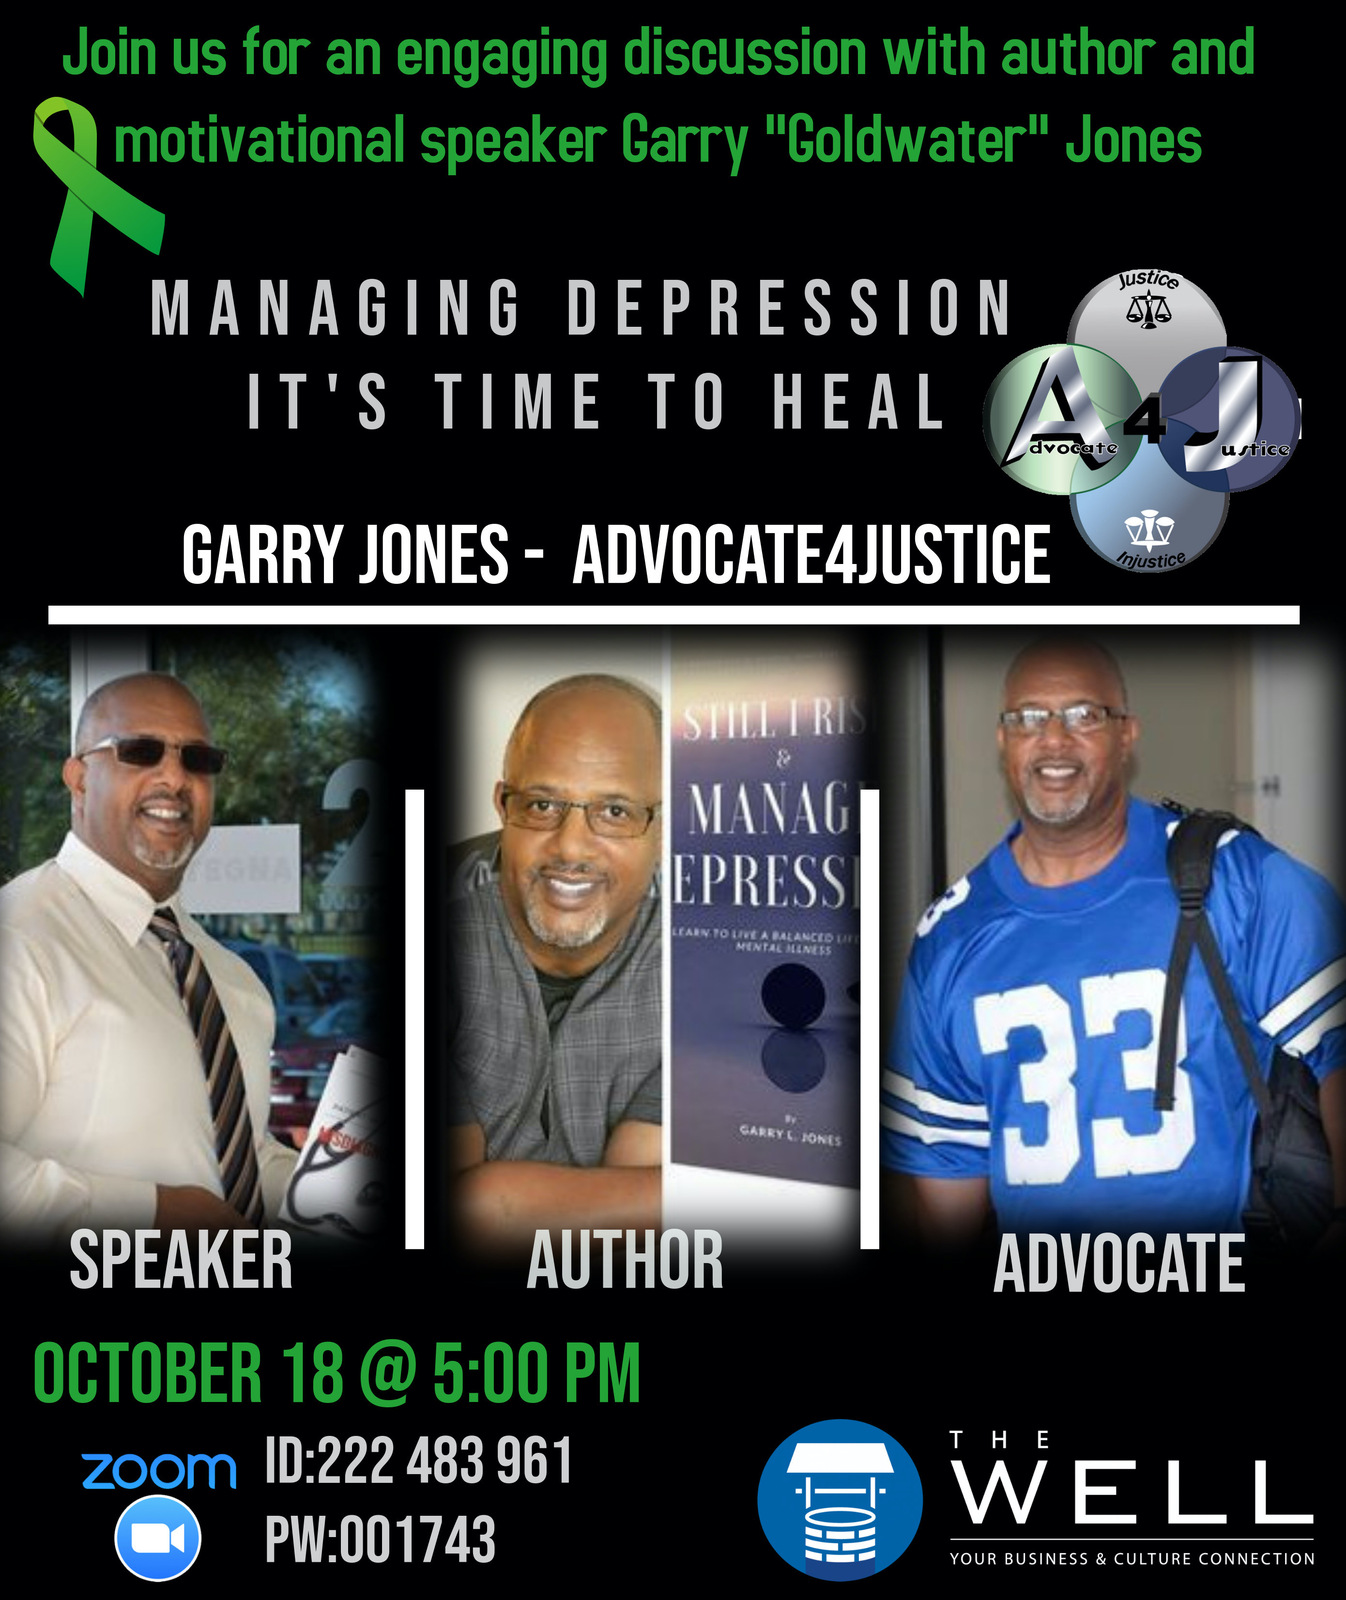 Lt. Garry Jones Writes Book & Talks Mental Health With Host Sallie Stone, Formerly of BET Network